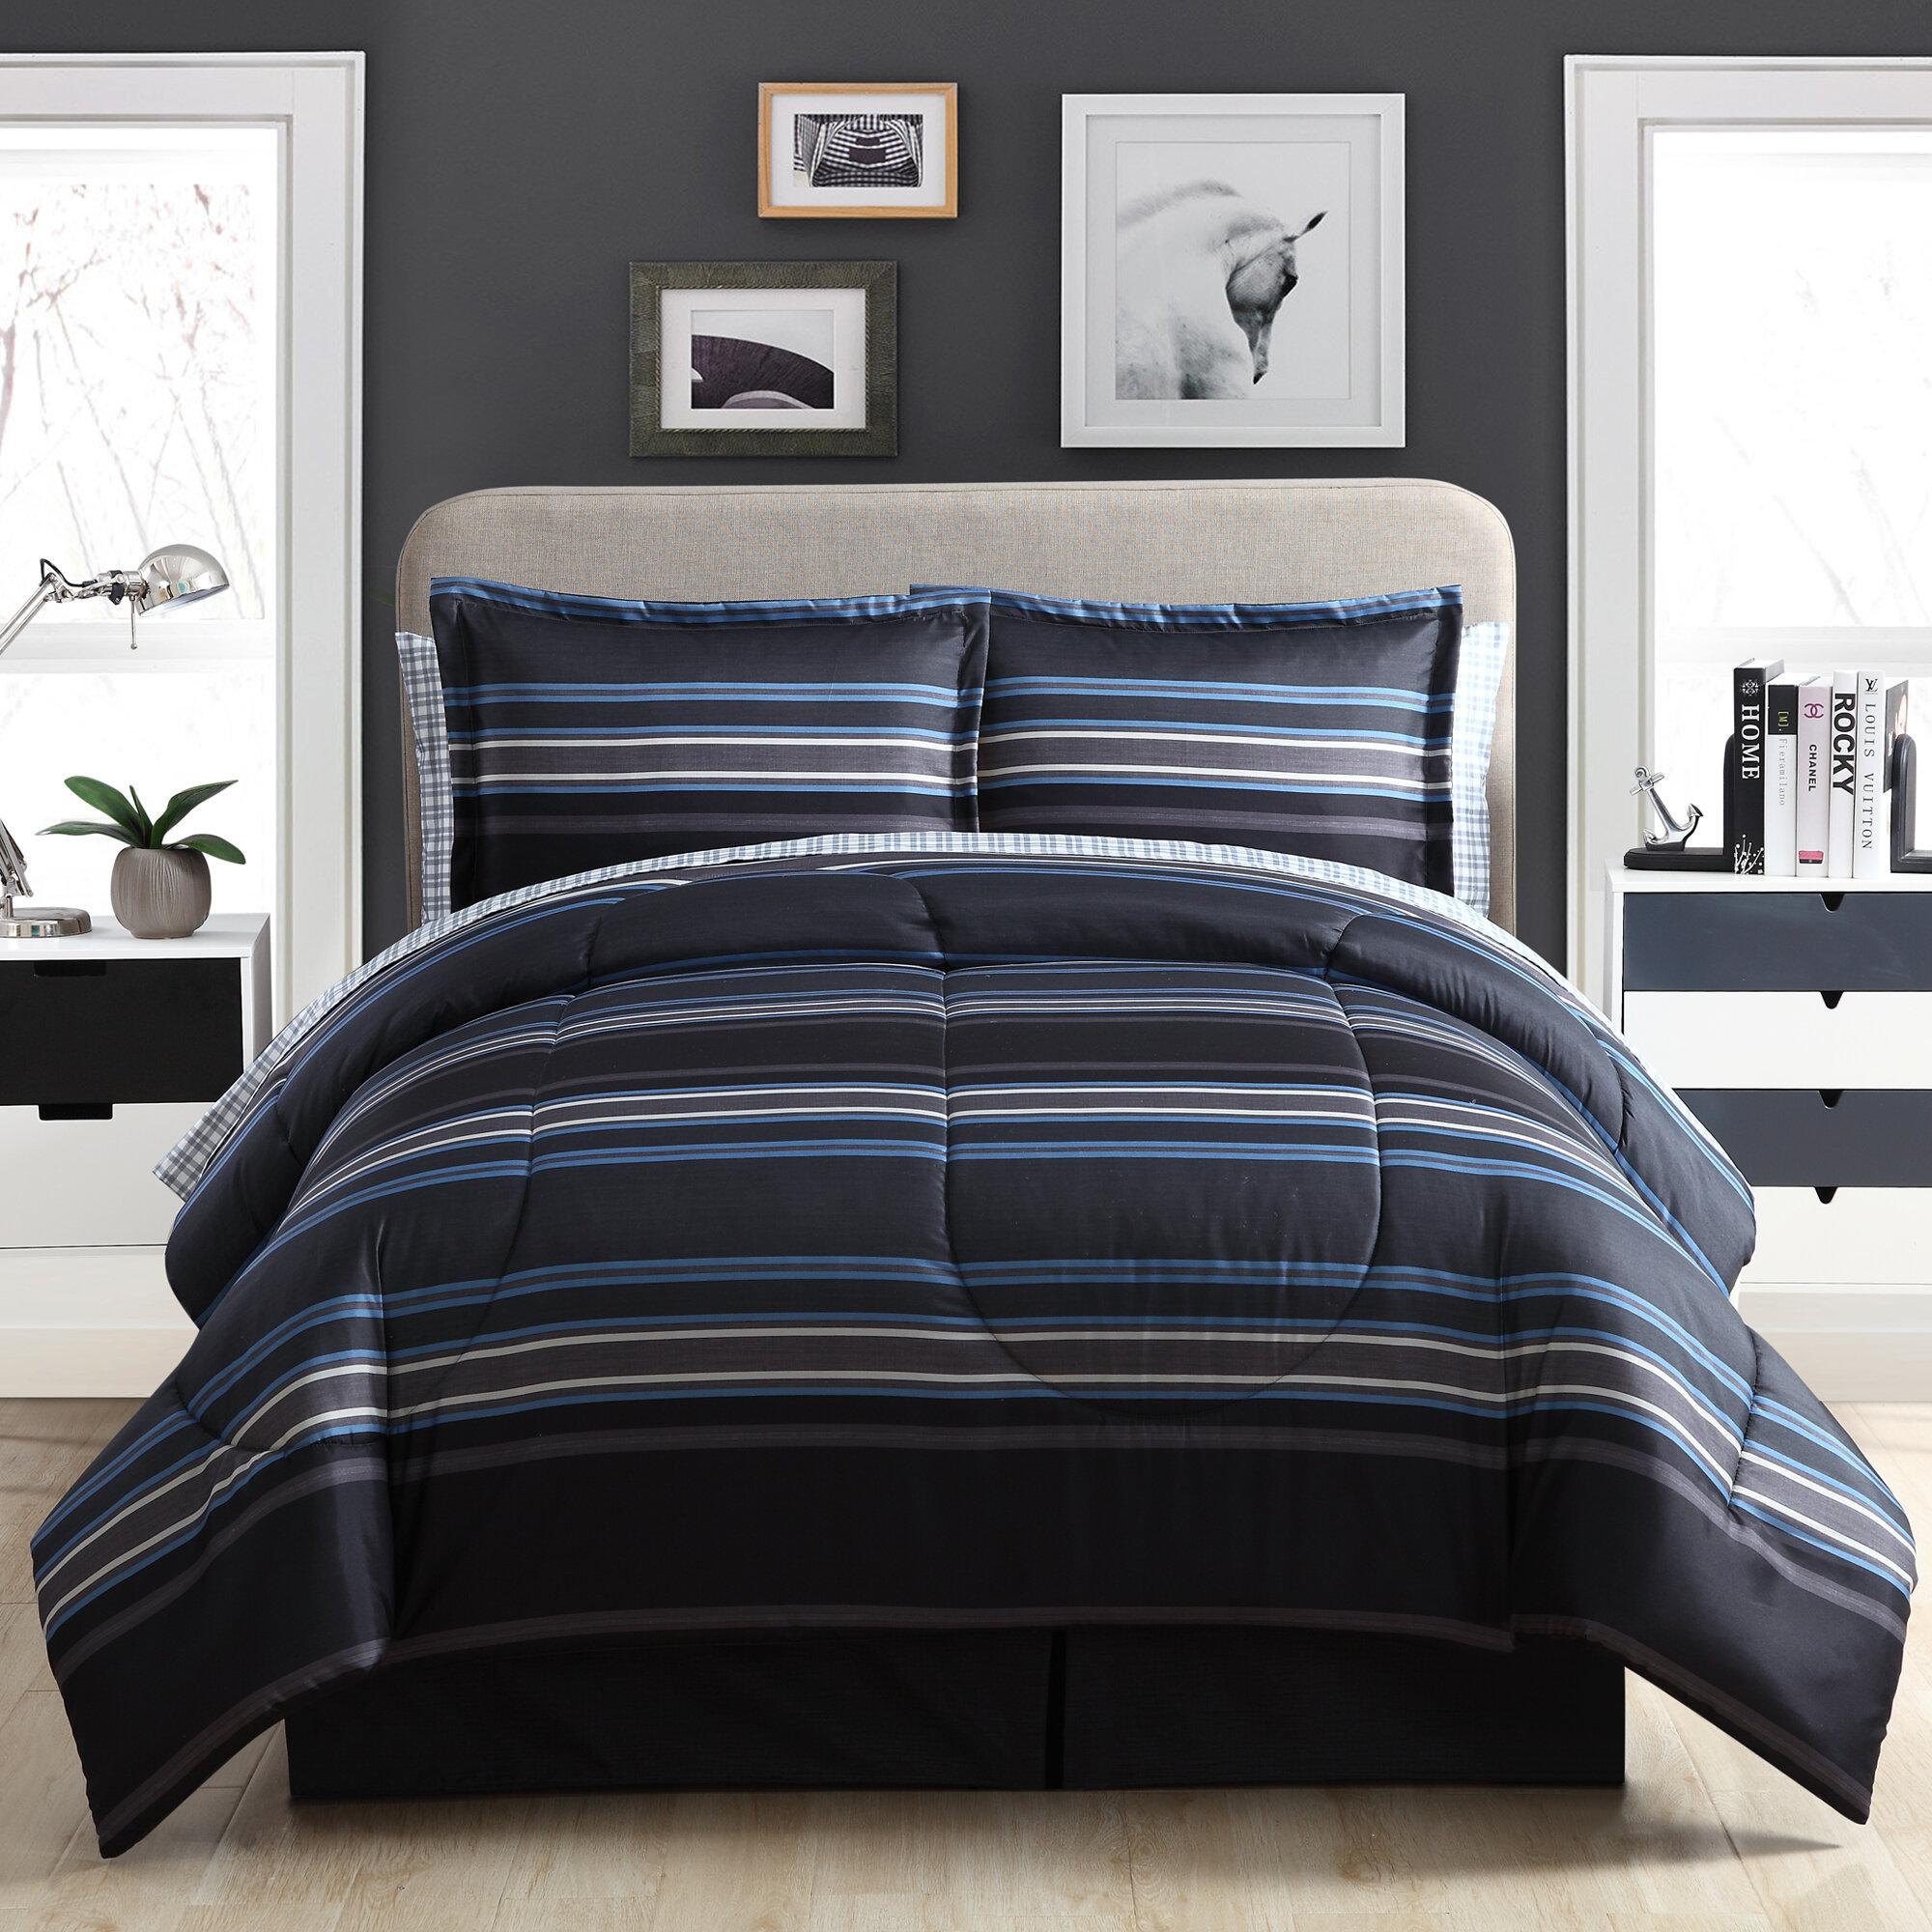 Ellison First Asia Soho Comforter Set Reviews Wayfair